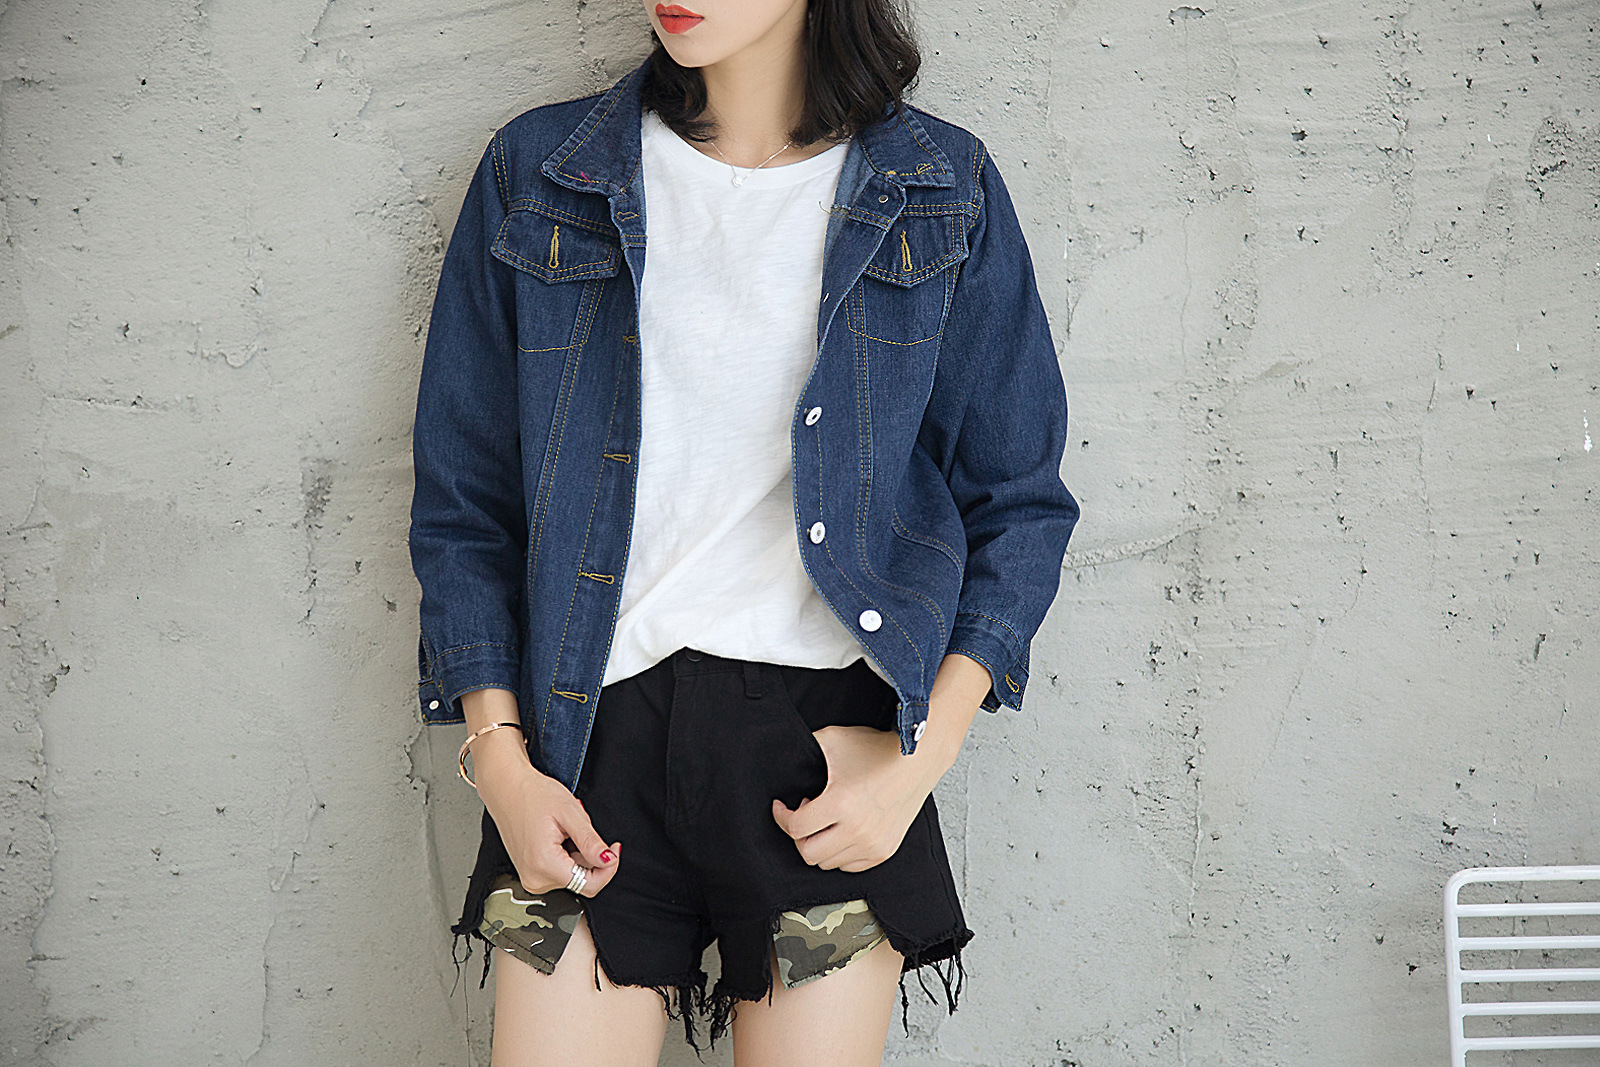 bedccb97d8c 2018 Spring Autumn Female Jean Jackets Korean Loose Long Sleeve ...